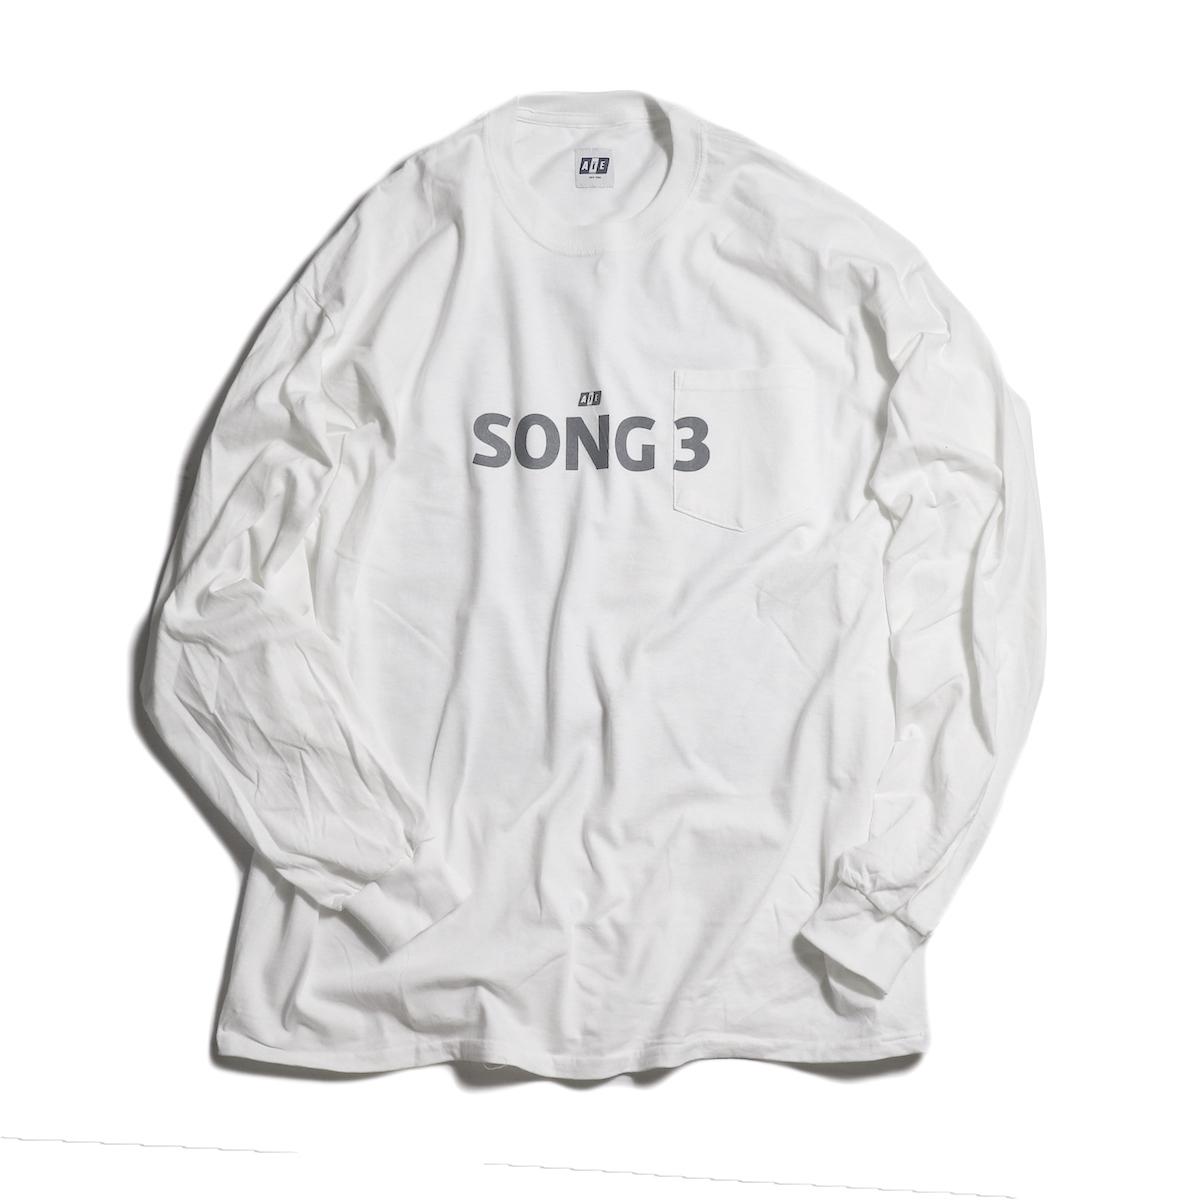 AiE / Big L/S Pocket T-shirt - Song3 -White